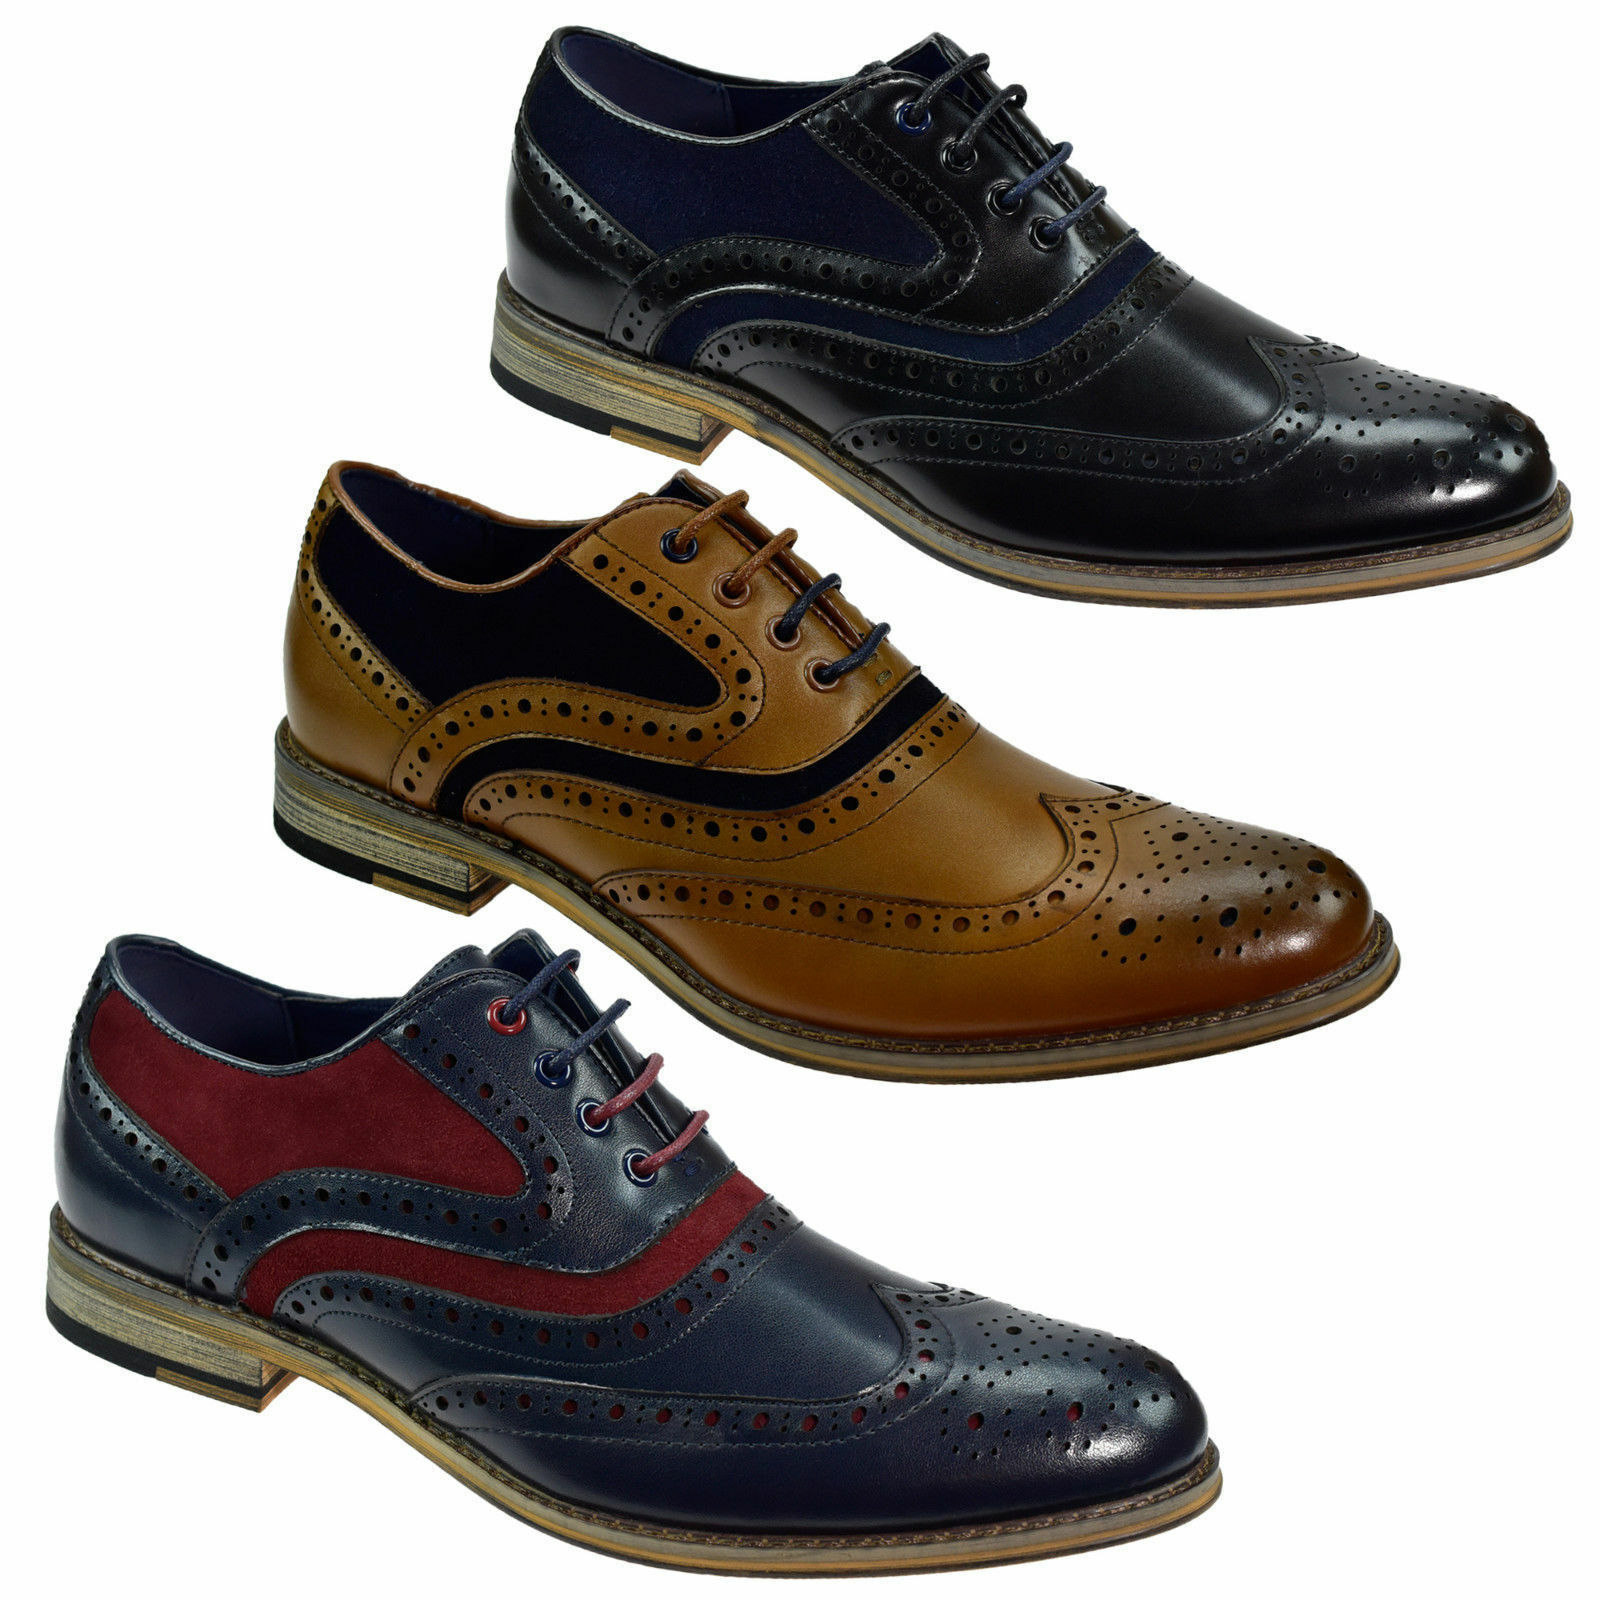 Mens Real Leather Italian Brogues 2 Tone schuhe Formal Wedding Casual Footwear